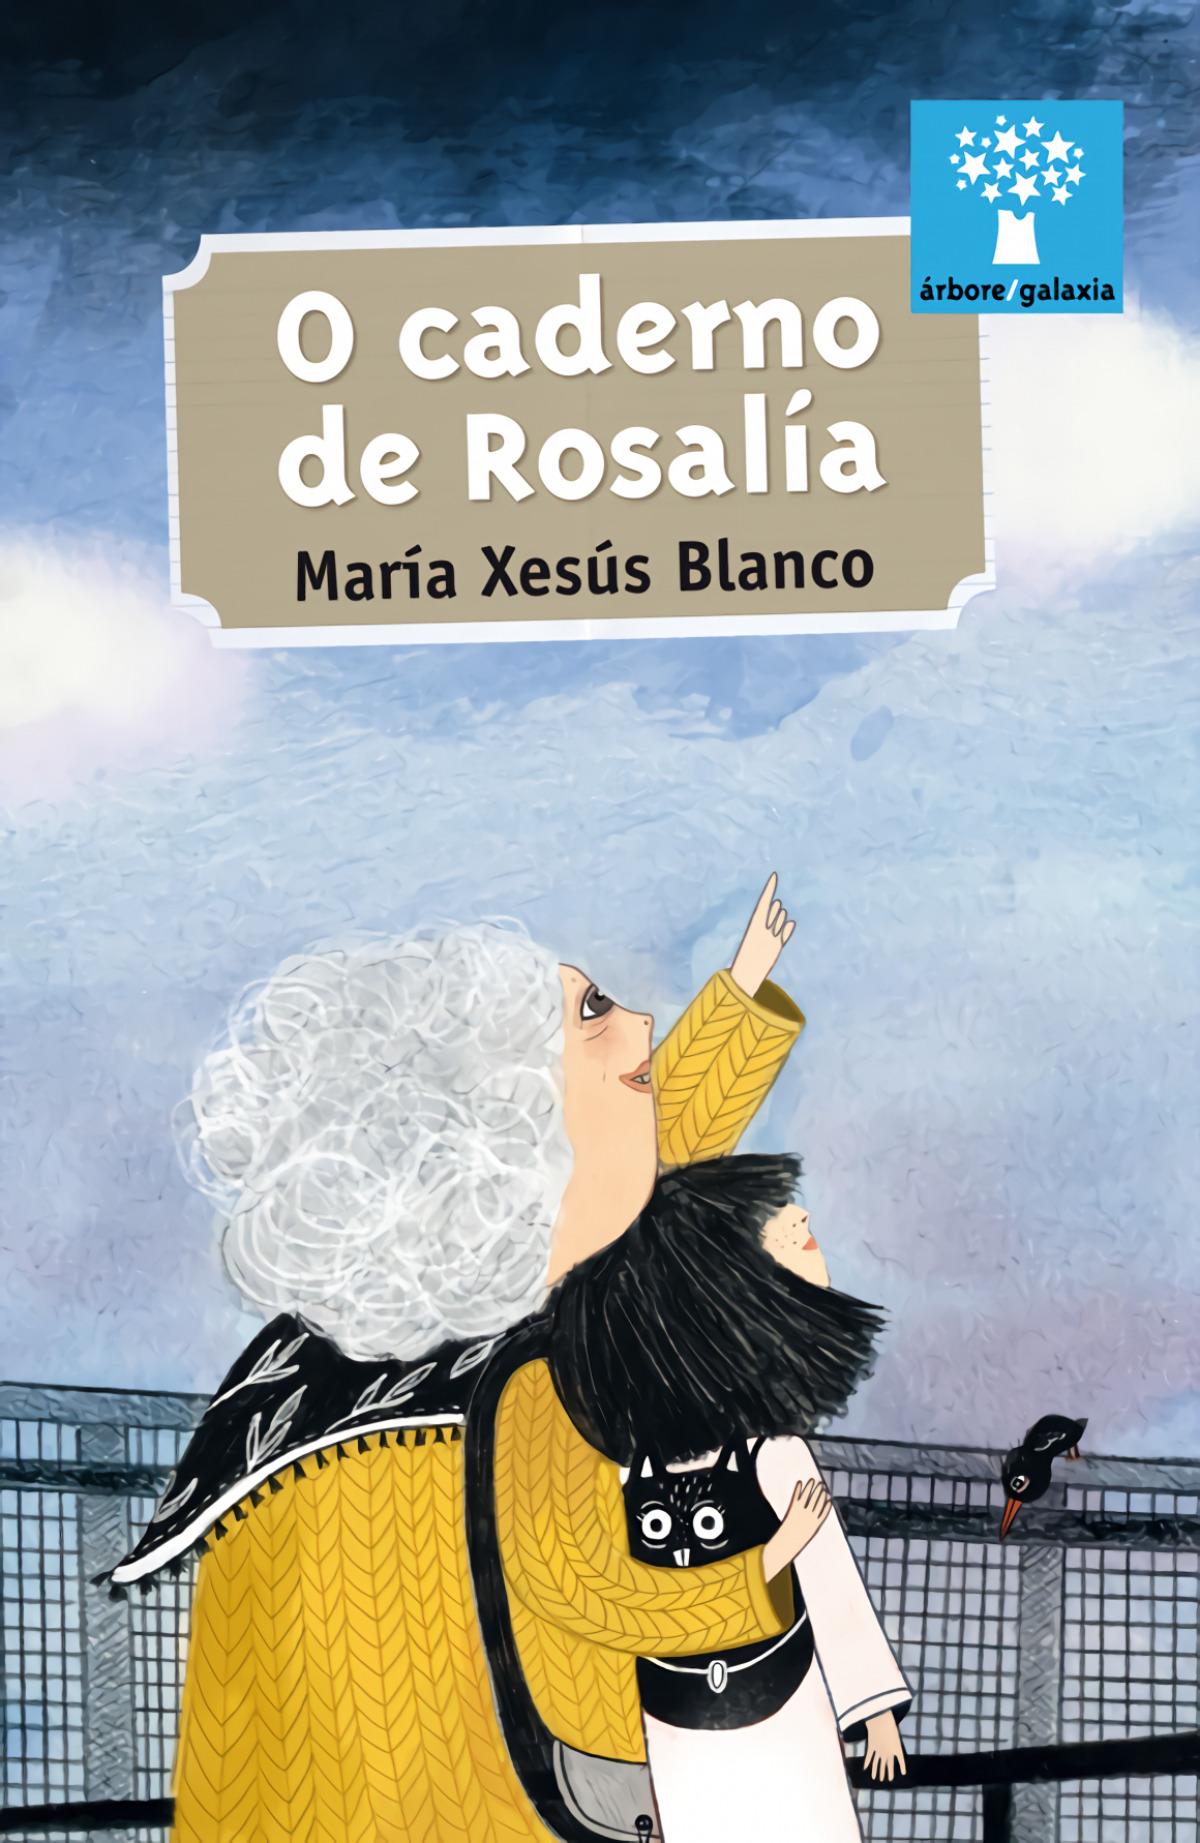 O caderno de Rosalía